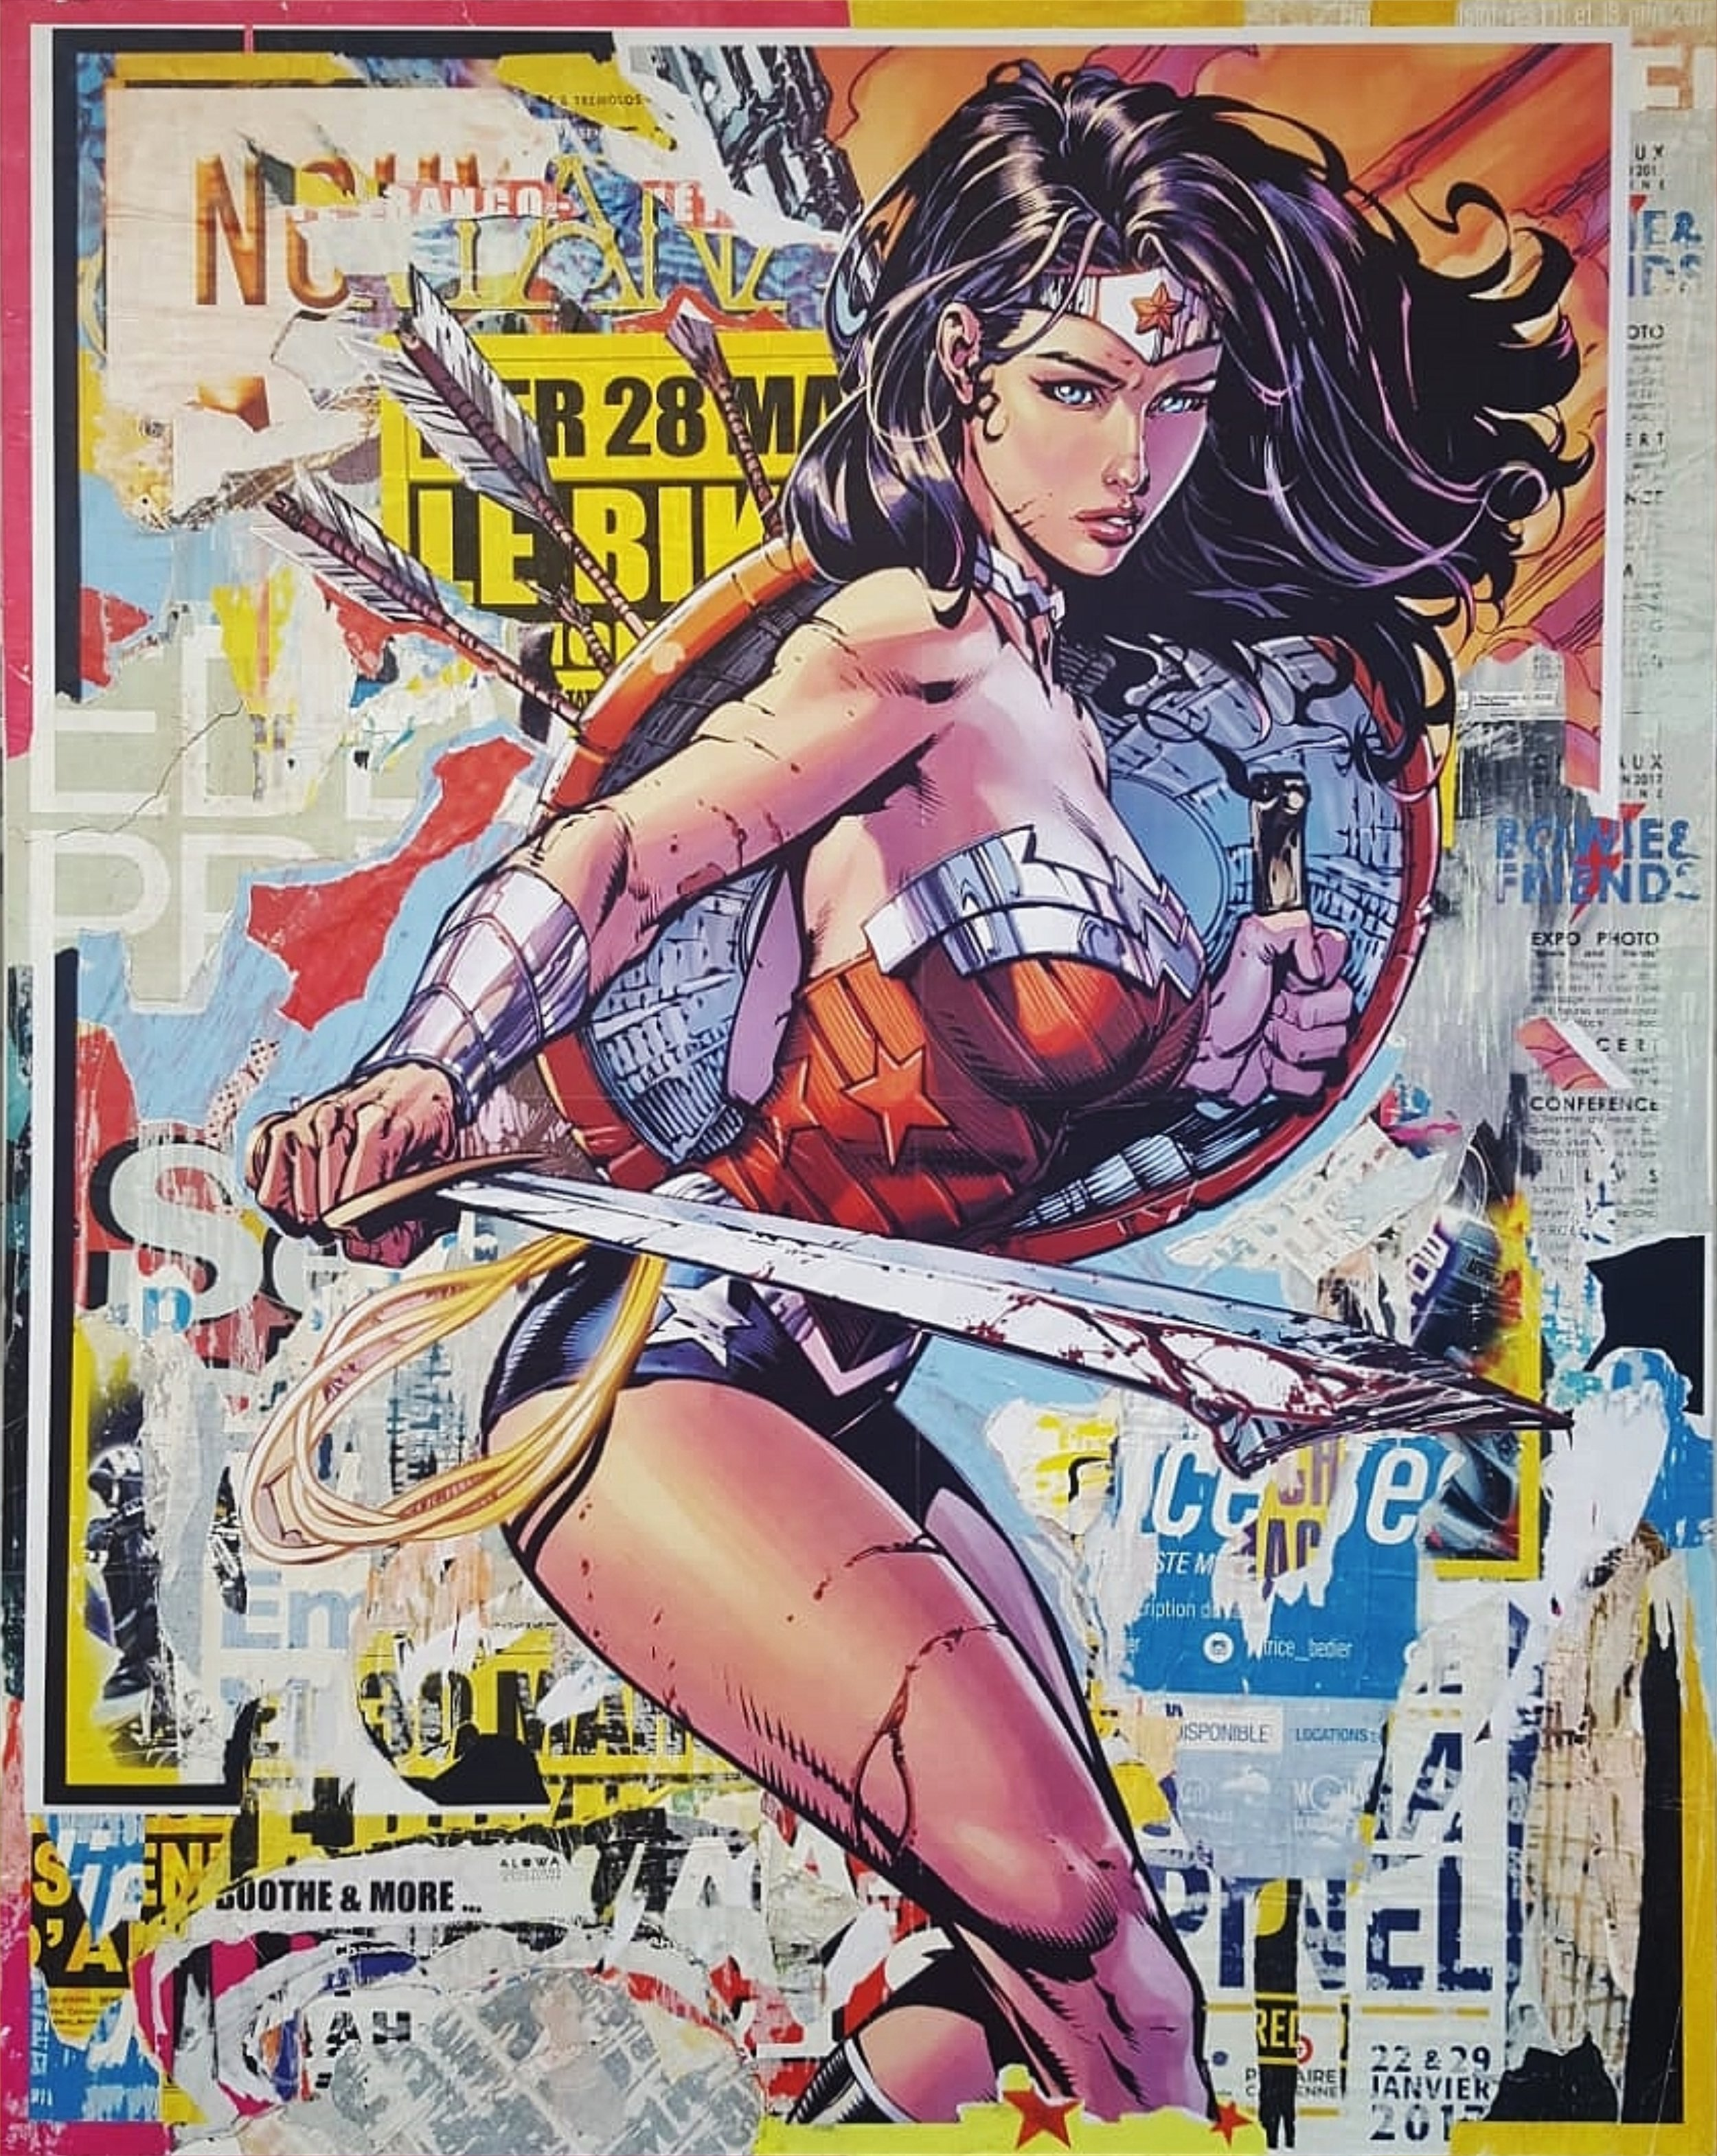 Wonder Woman (59 x 47)